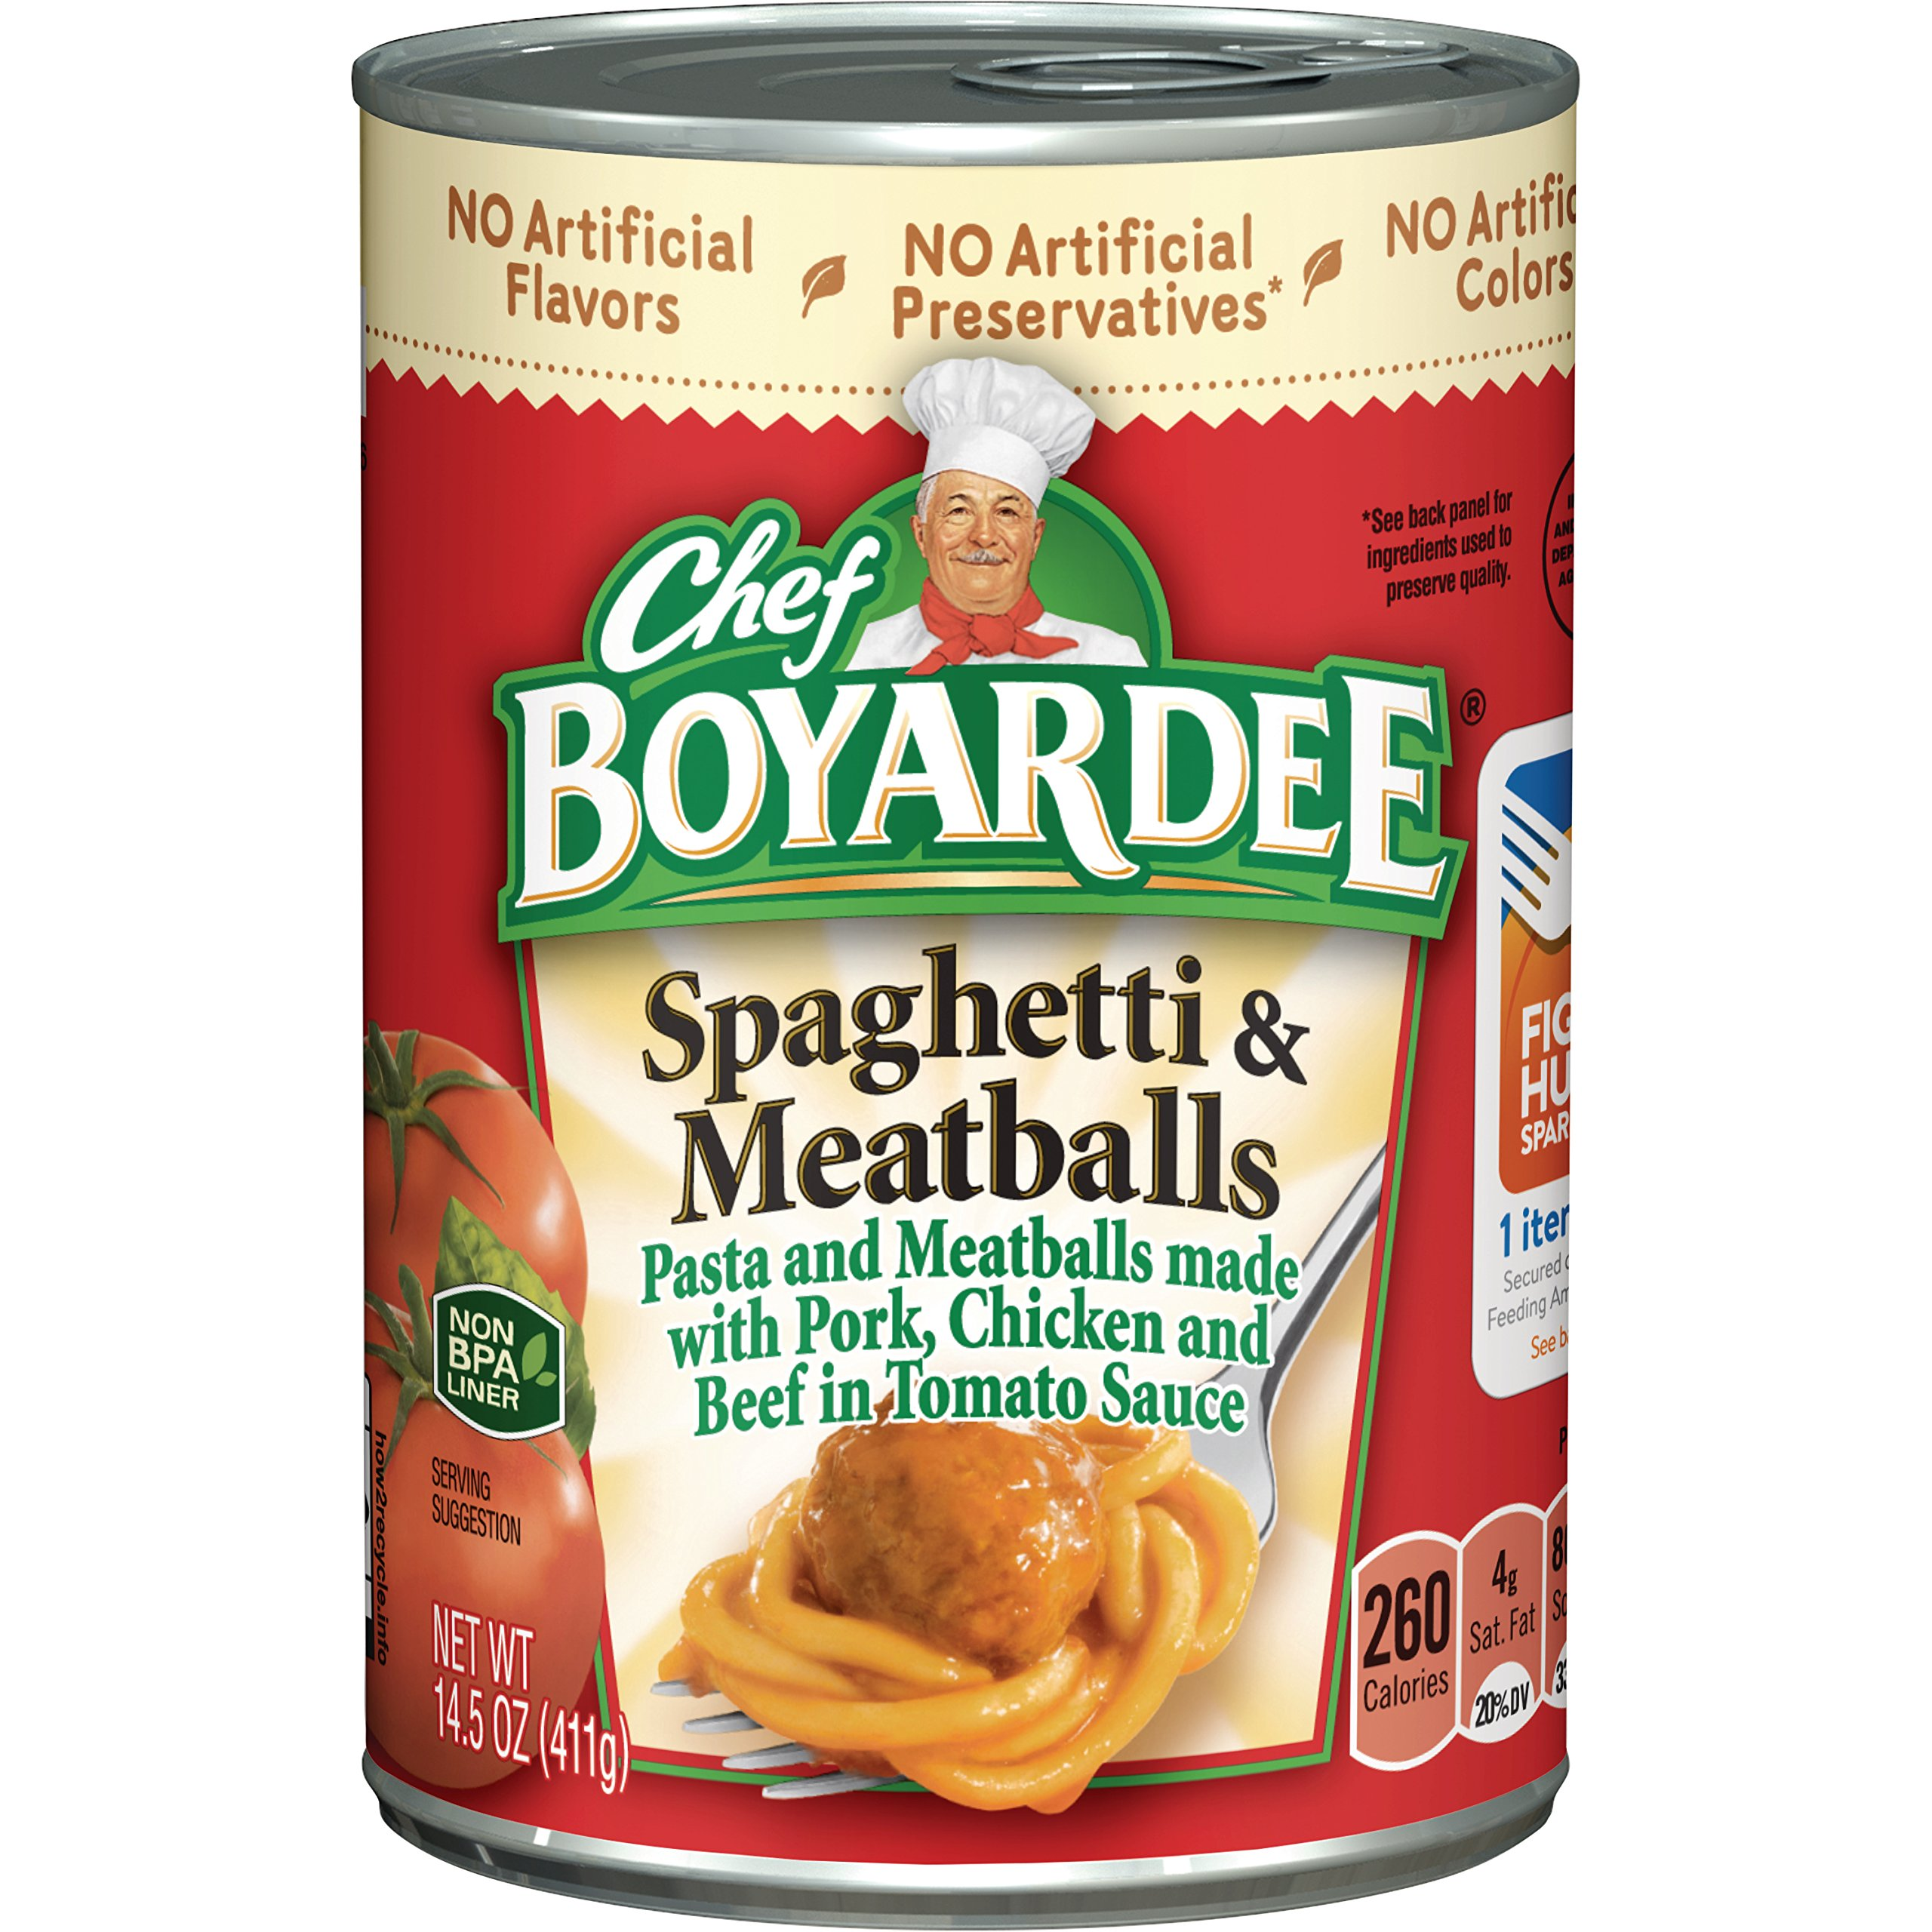 Chef Boyardee Spaghetti & Meatballs, 14.5 Oz. (Pack of 24)